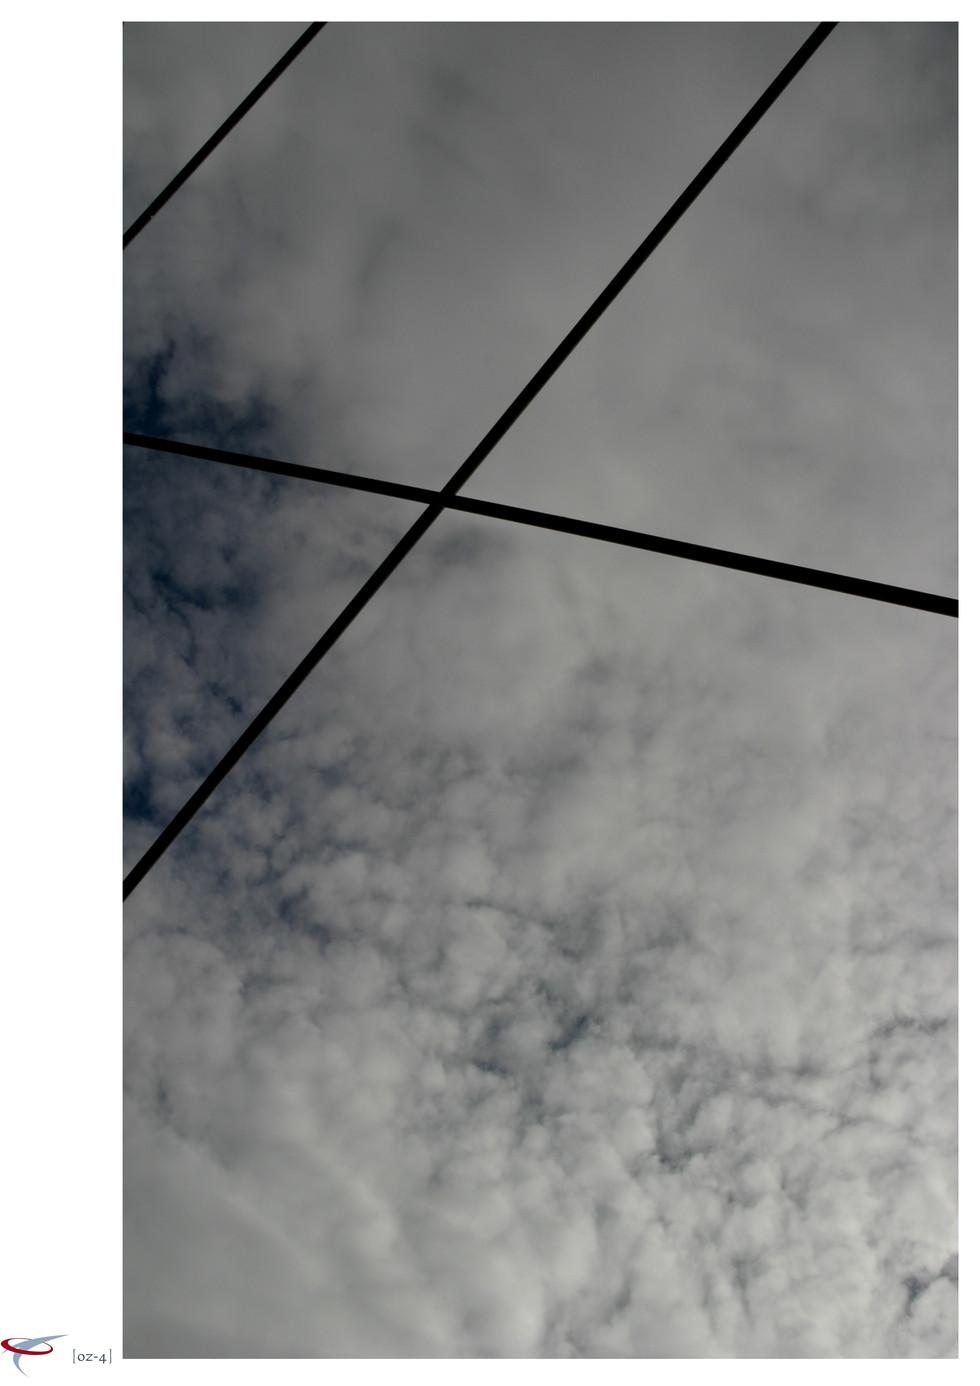 baumwipfelpfad neuschoenau 09.jpg